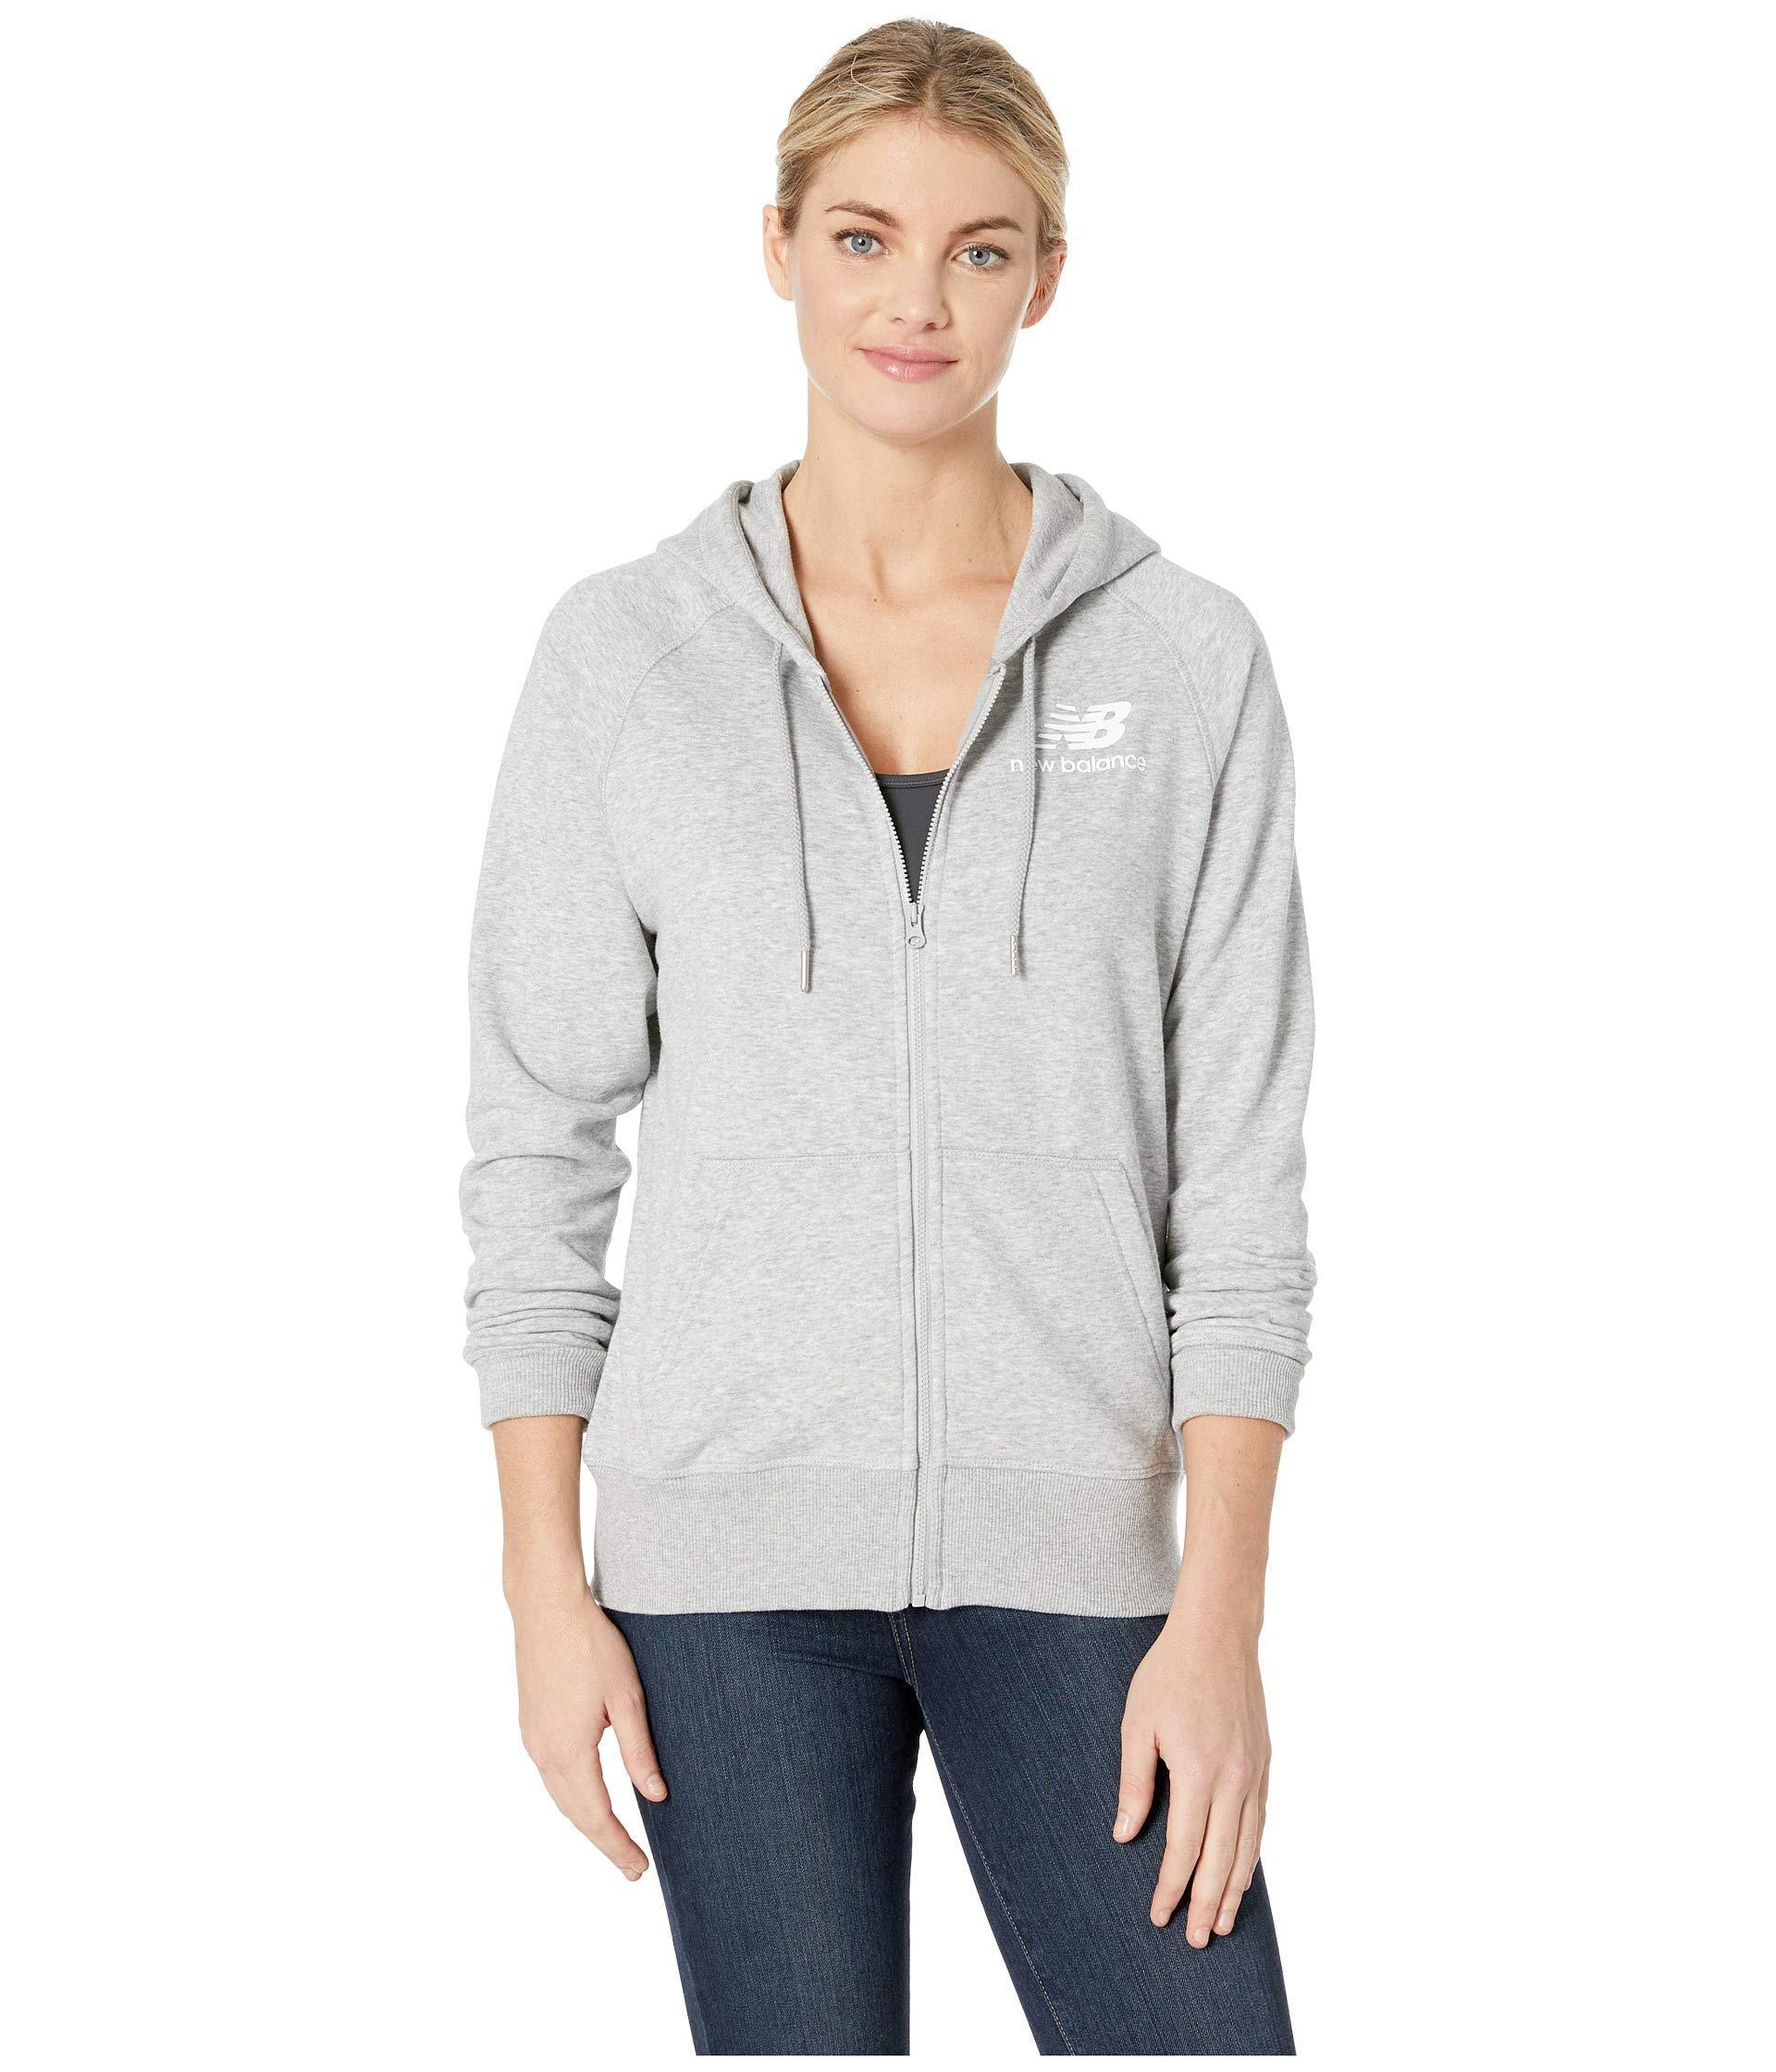 677cae2f6ea8a New Balance. Gray Essentials Full Zip Hoodie (pigment) Women's Sweatshirt